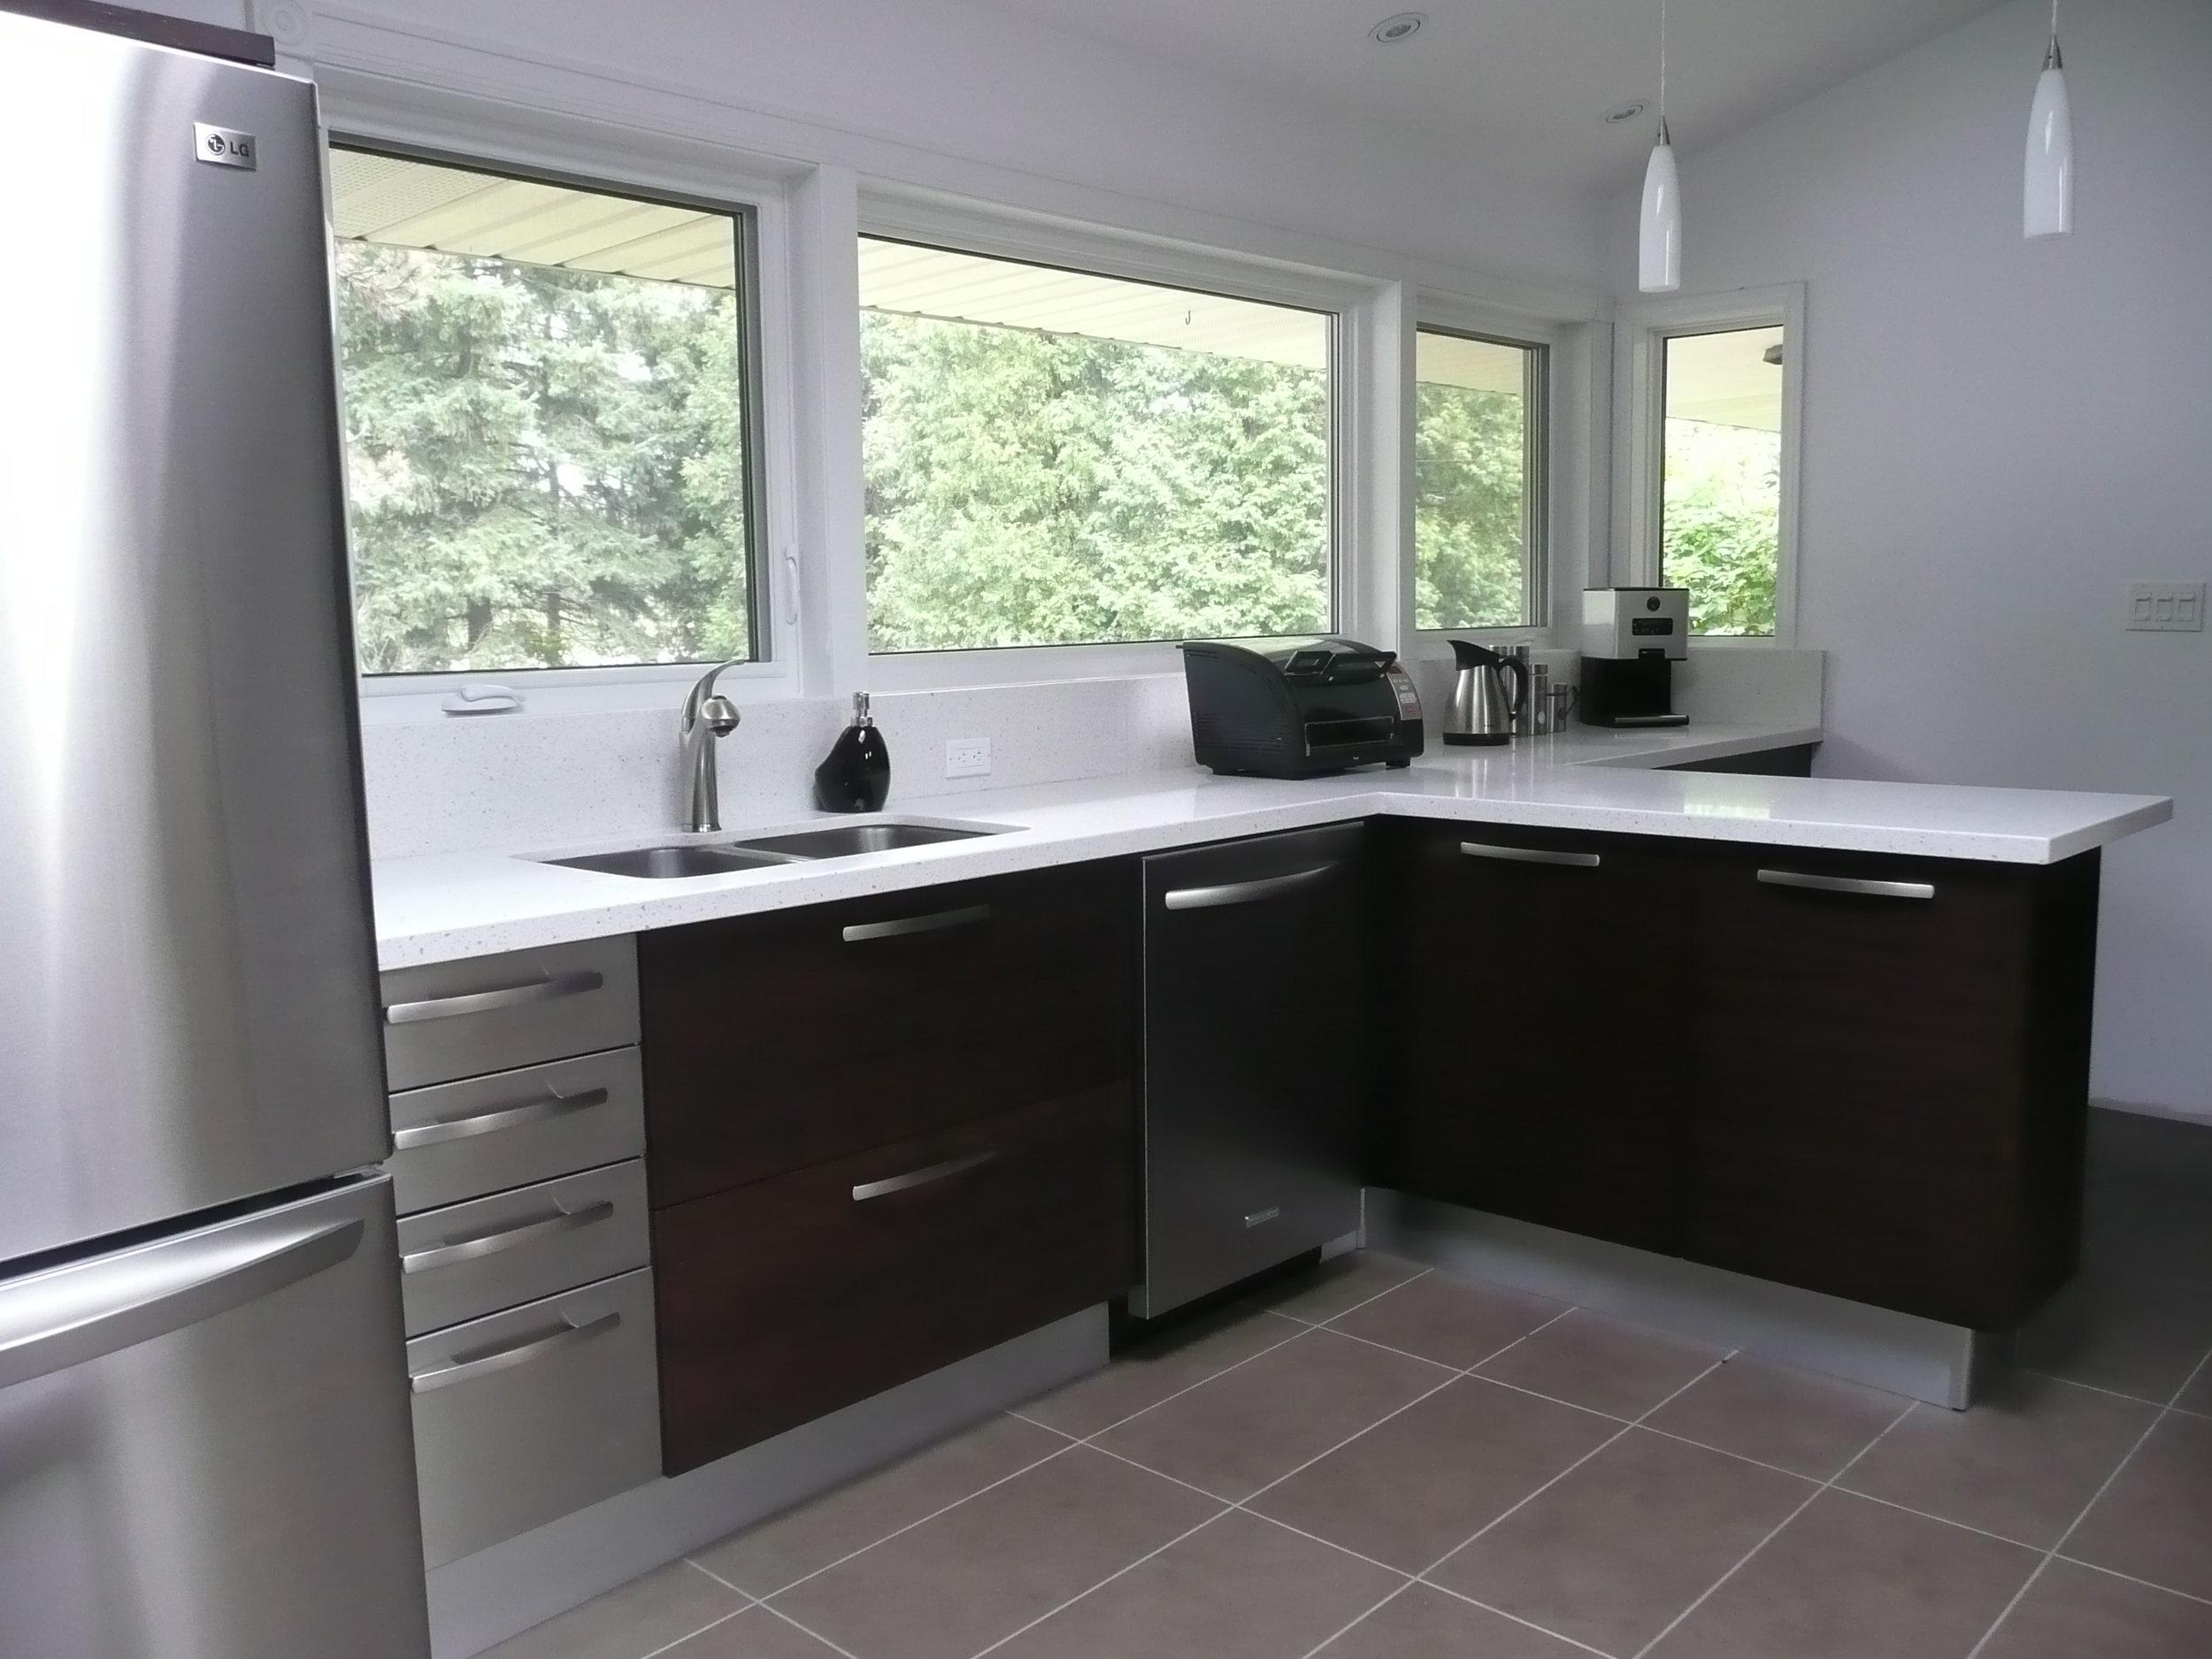 Kitchen 15 Pic 1.JPG